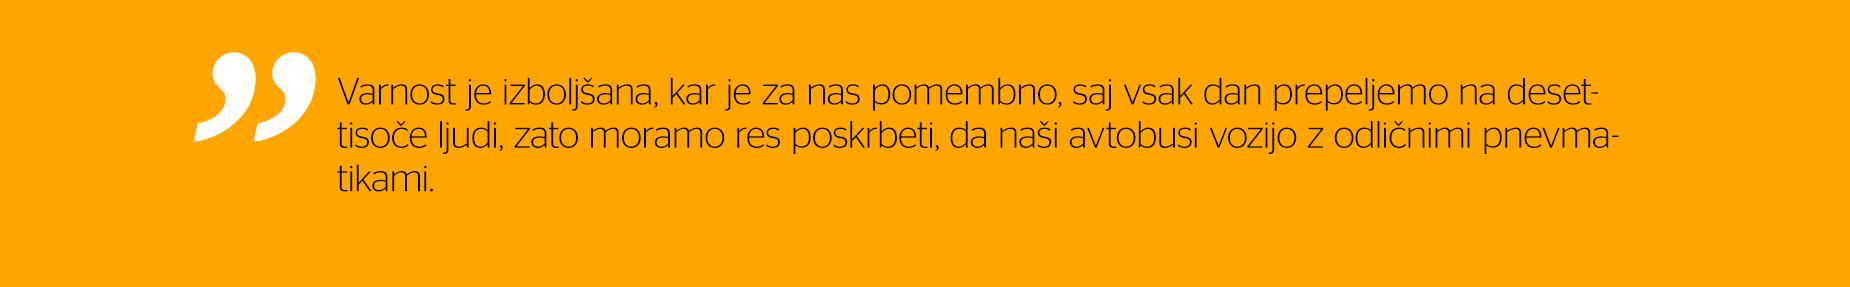 hungary-quote